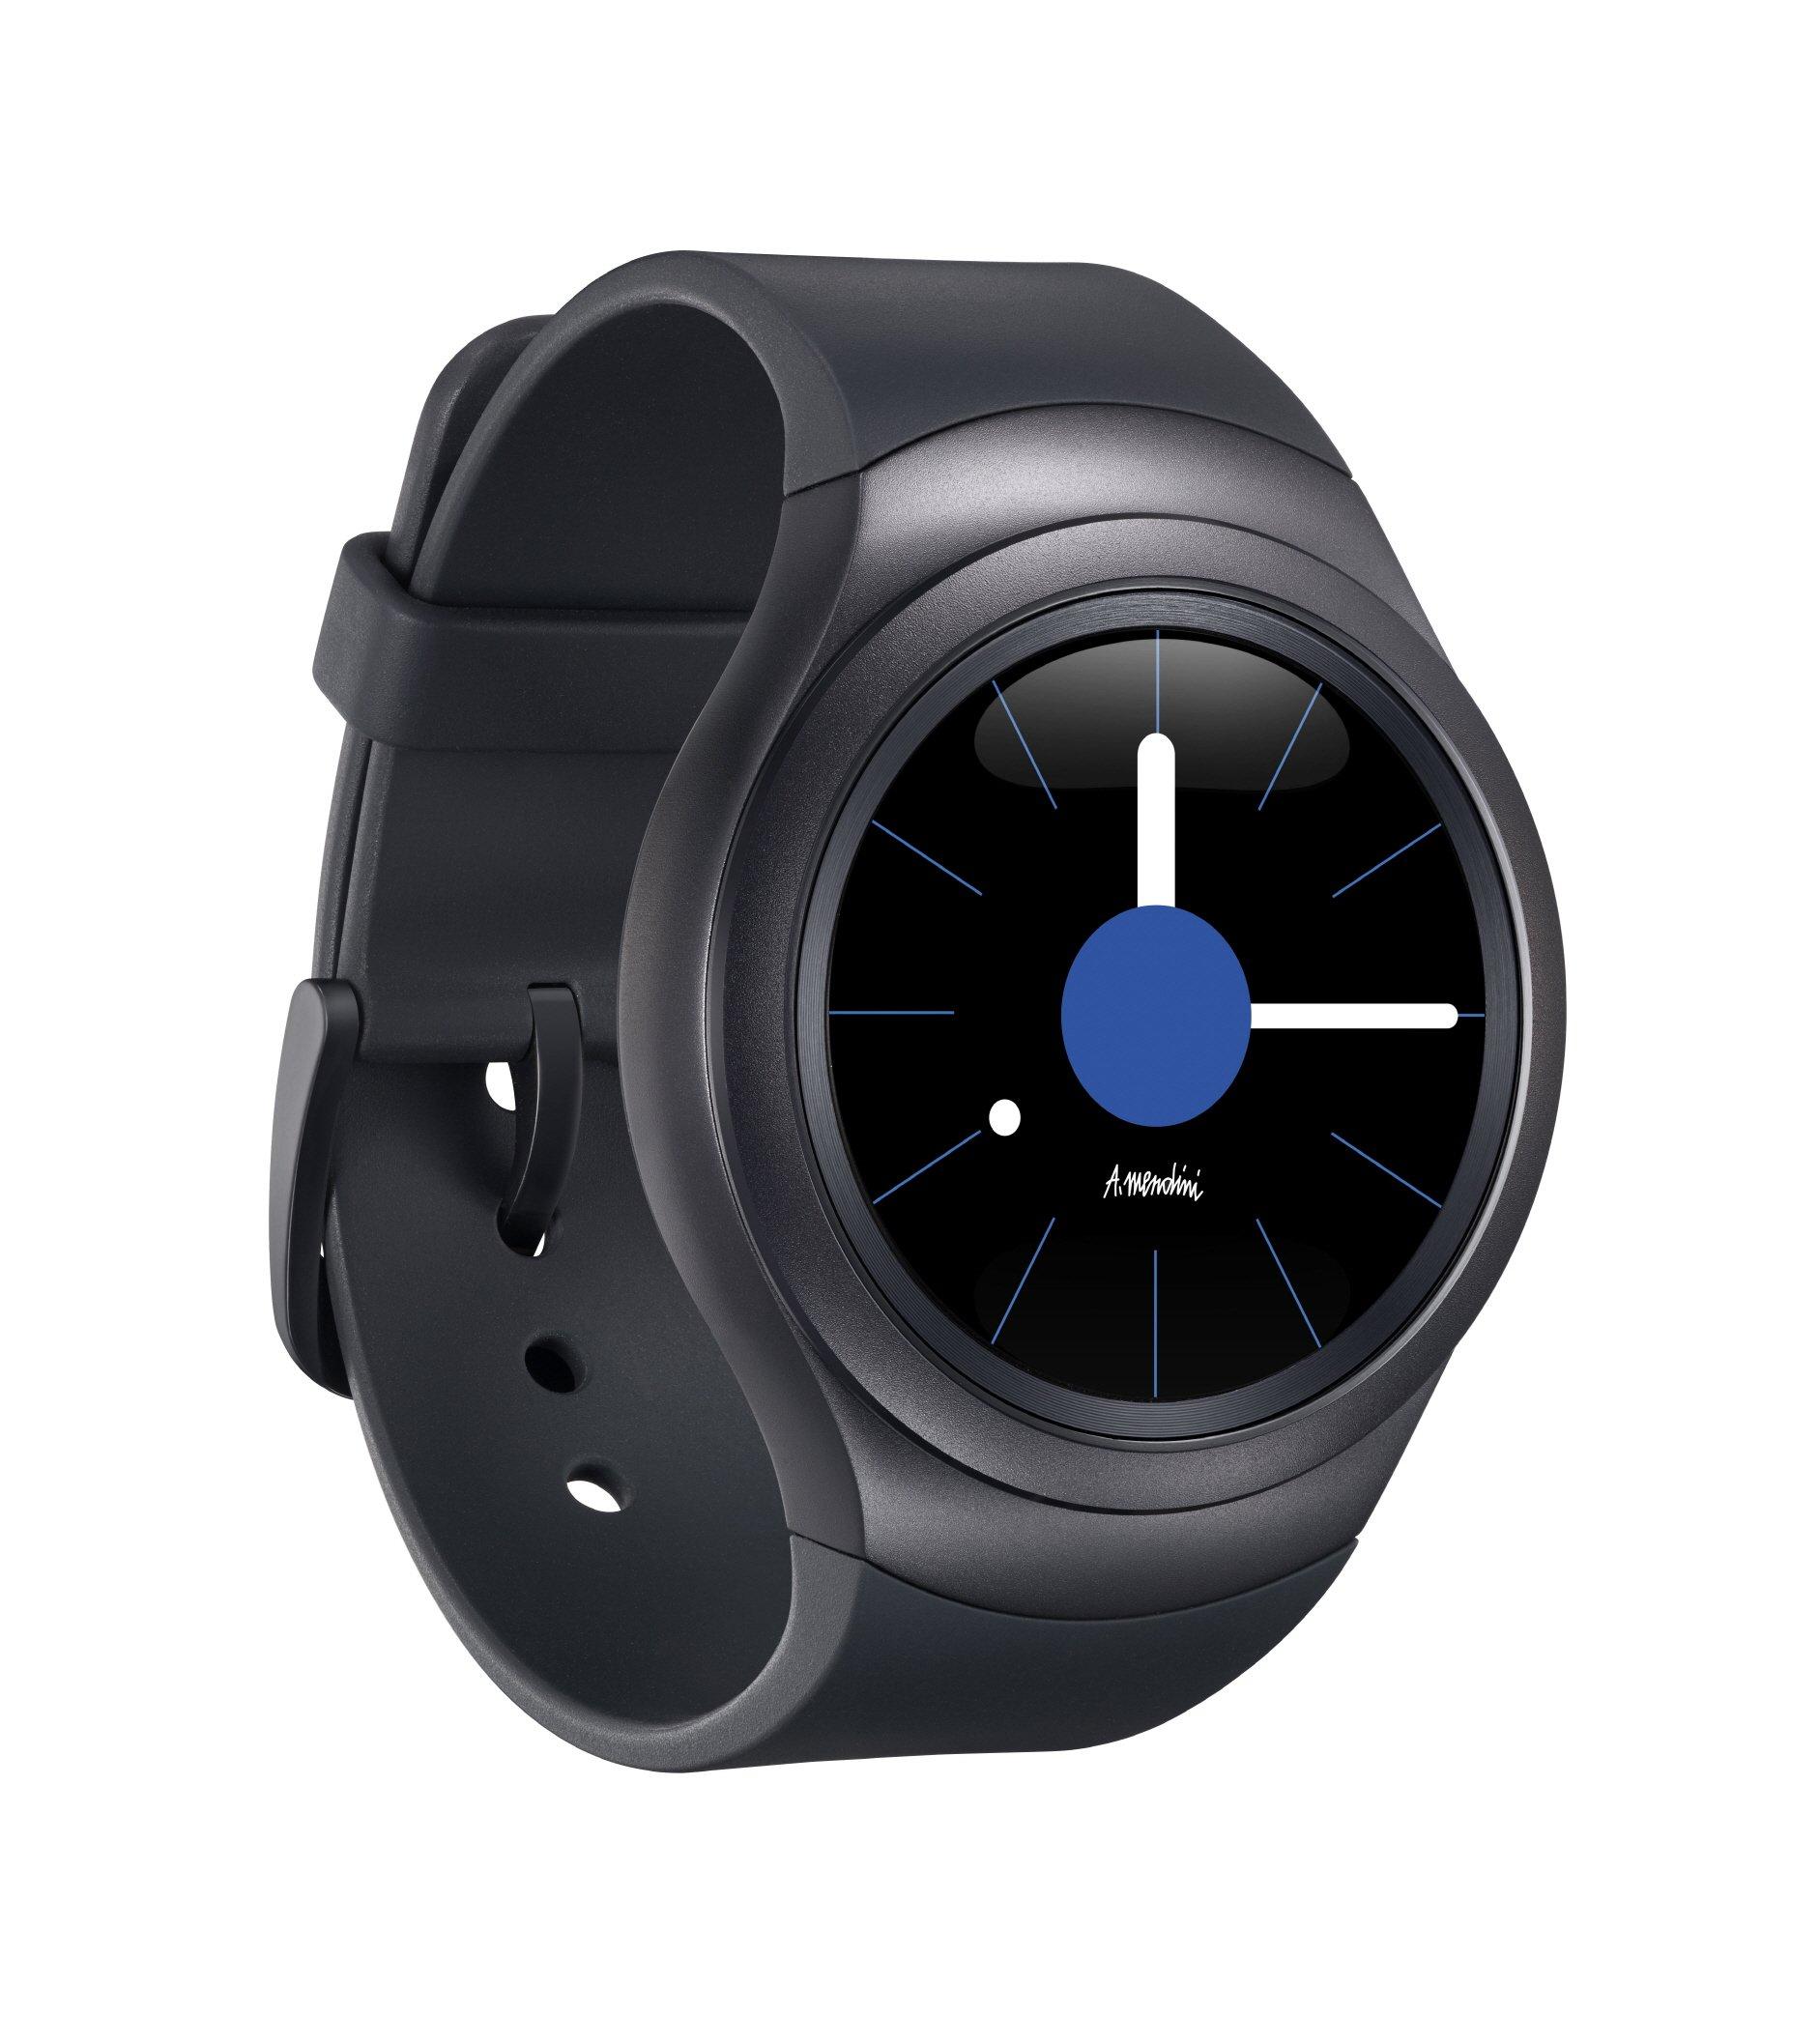 Samsung Gear S2 Smartwatch (Certified Refurbished) (Dark Gray) by Samsung (Image #2)